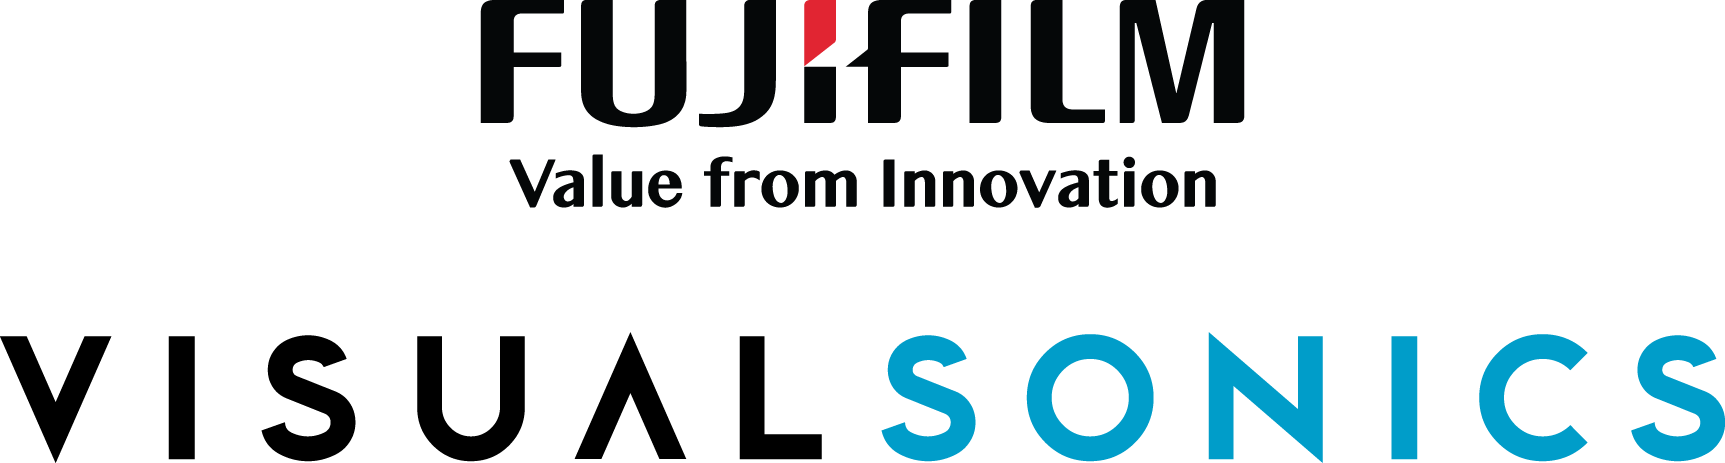 FUJIFILM VisualSonics Logo